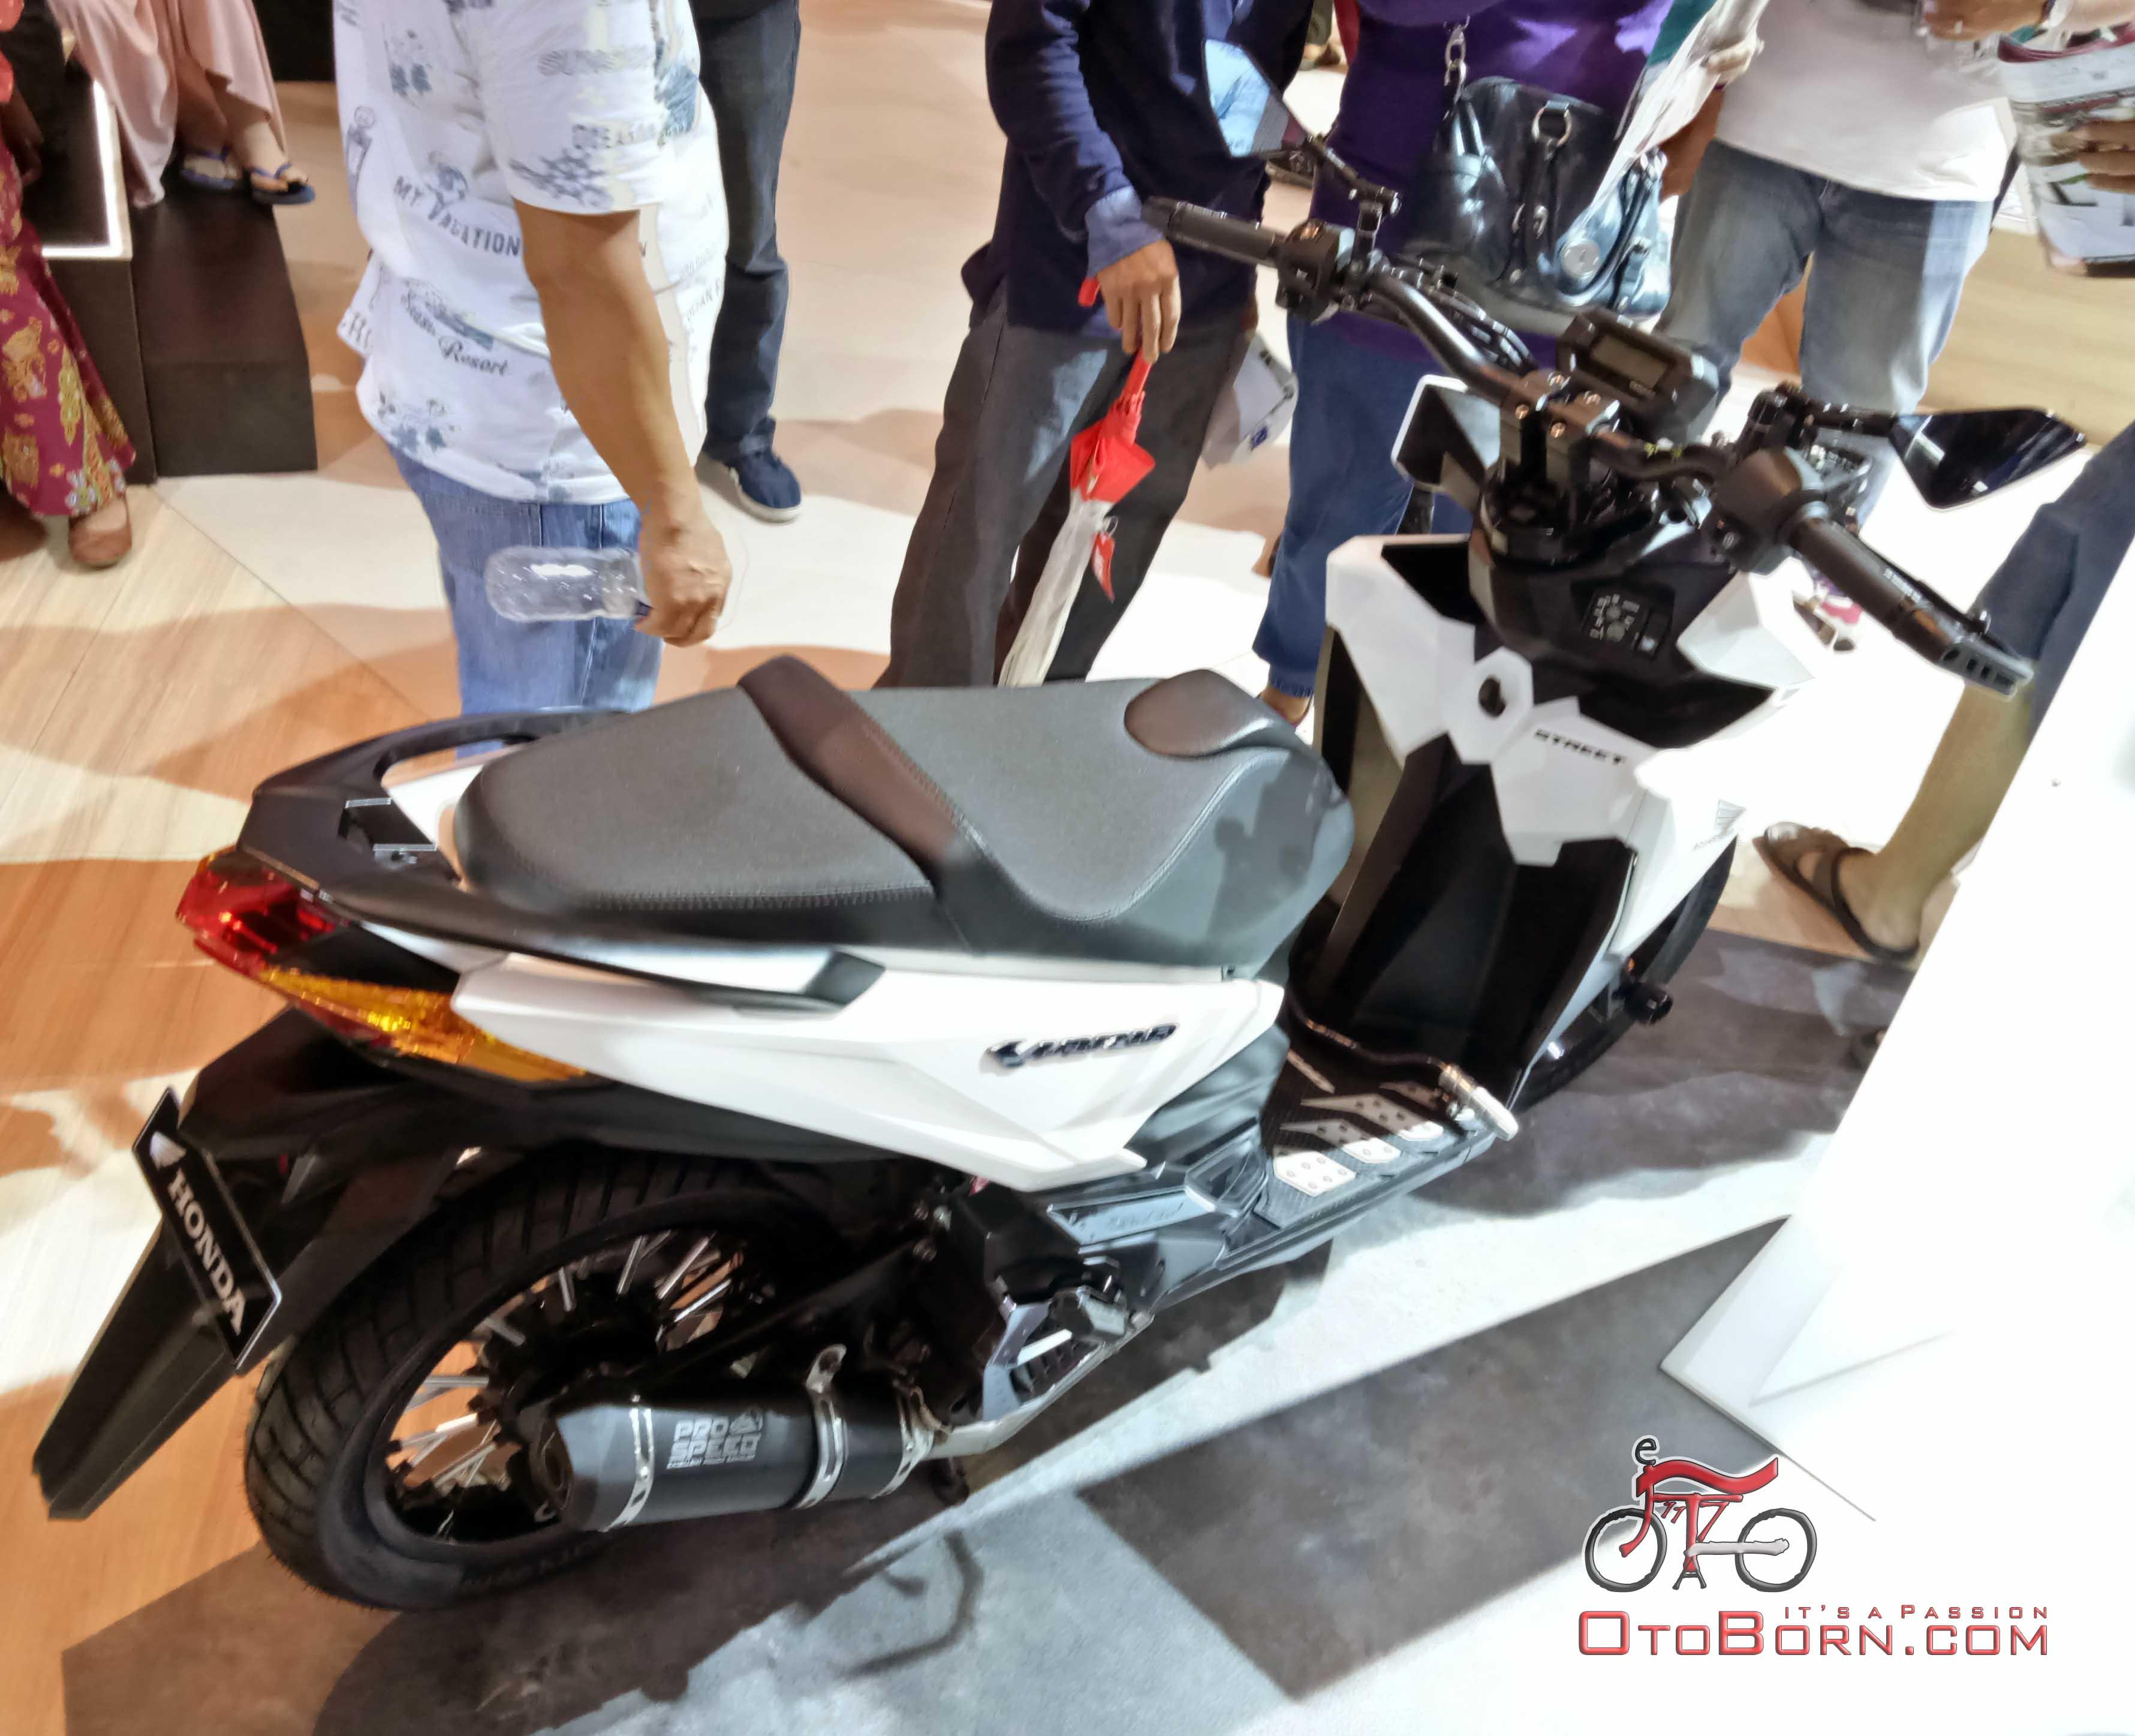 Kumpulan 70 Modifikasi Stang Motor Honda Beat Terbaru Dan Terlengkap